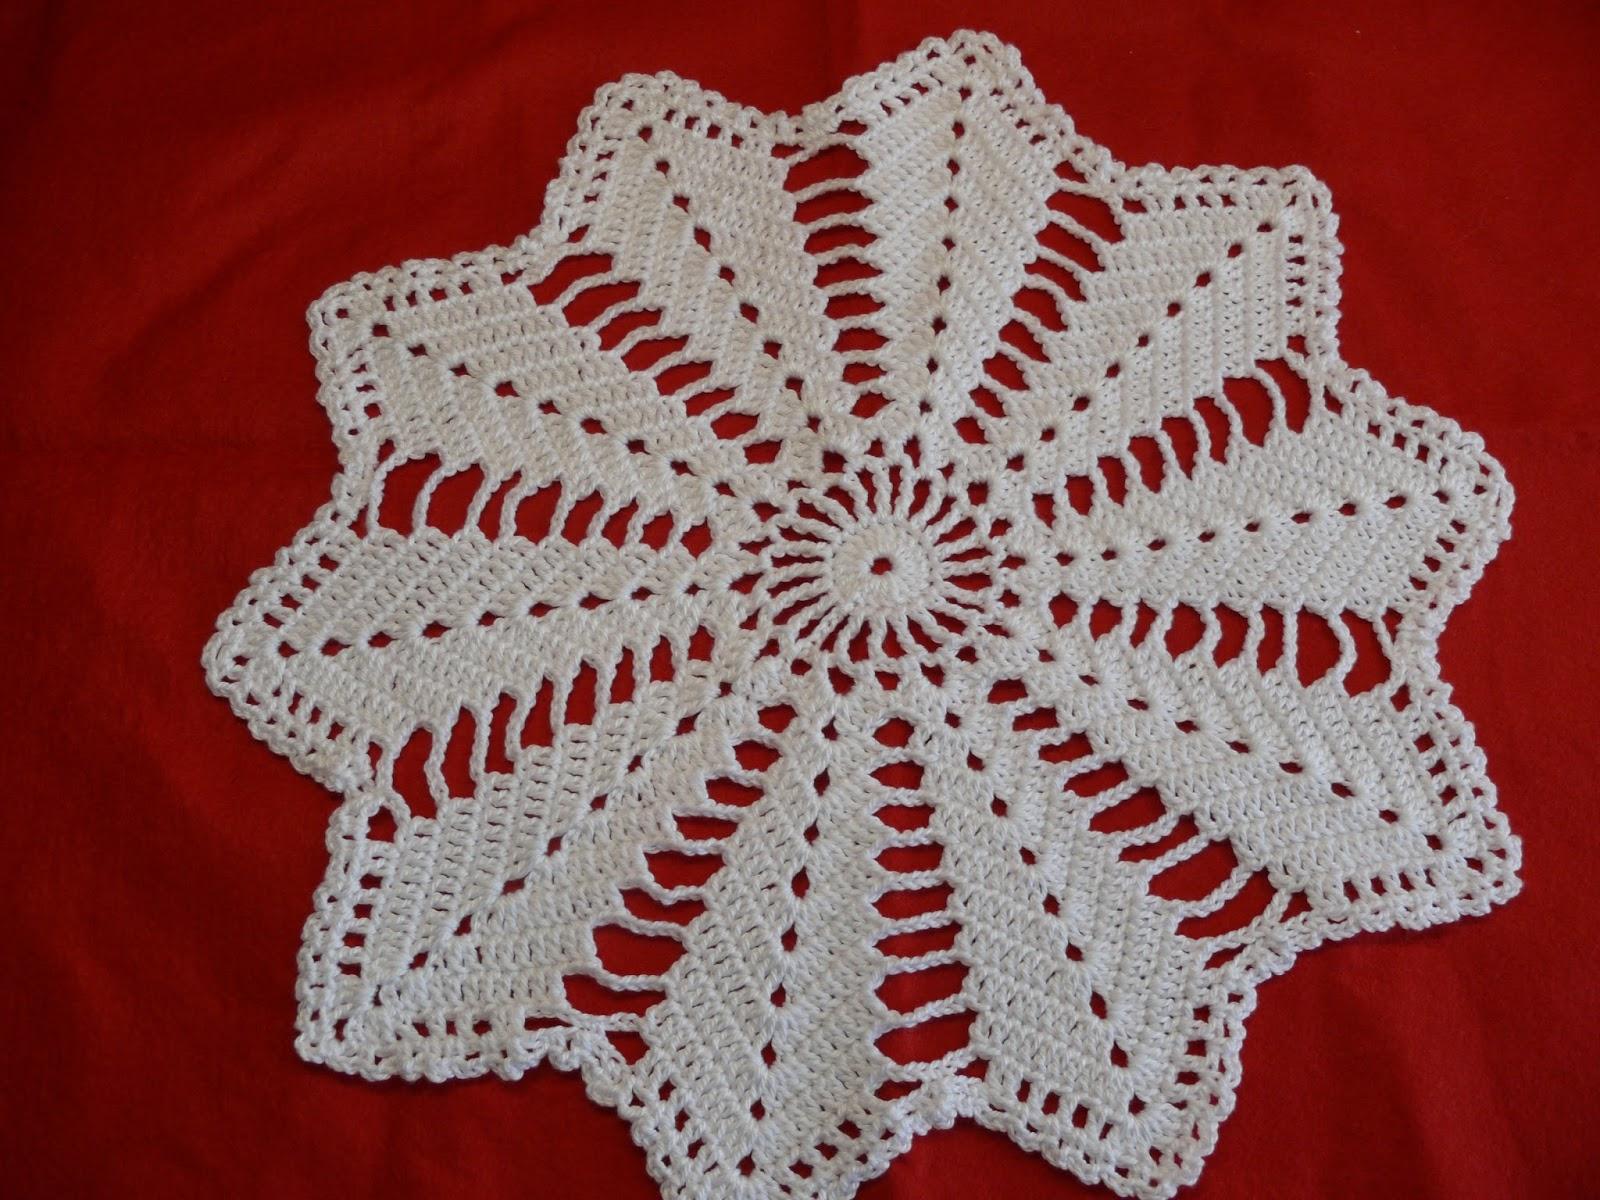 String Theory Crochet Doily Or Mandala A Crochet Dilemna